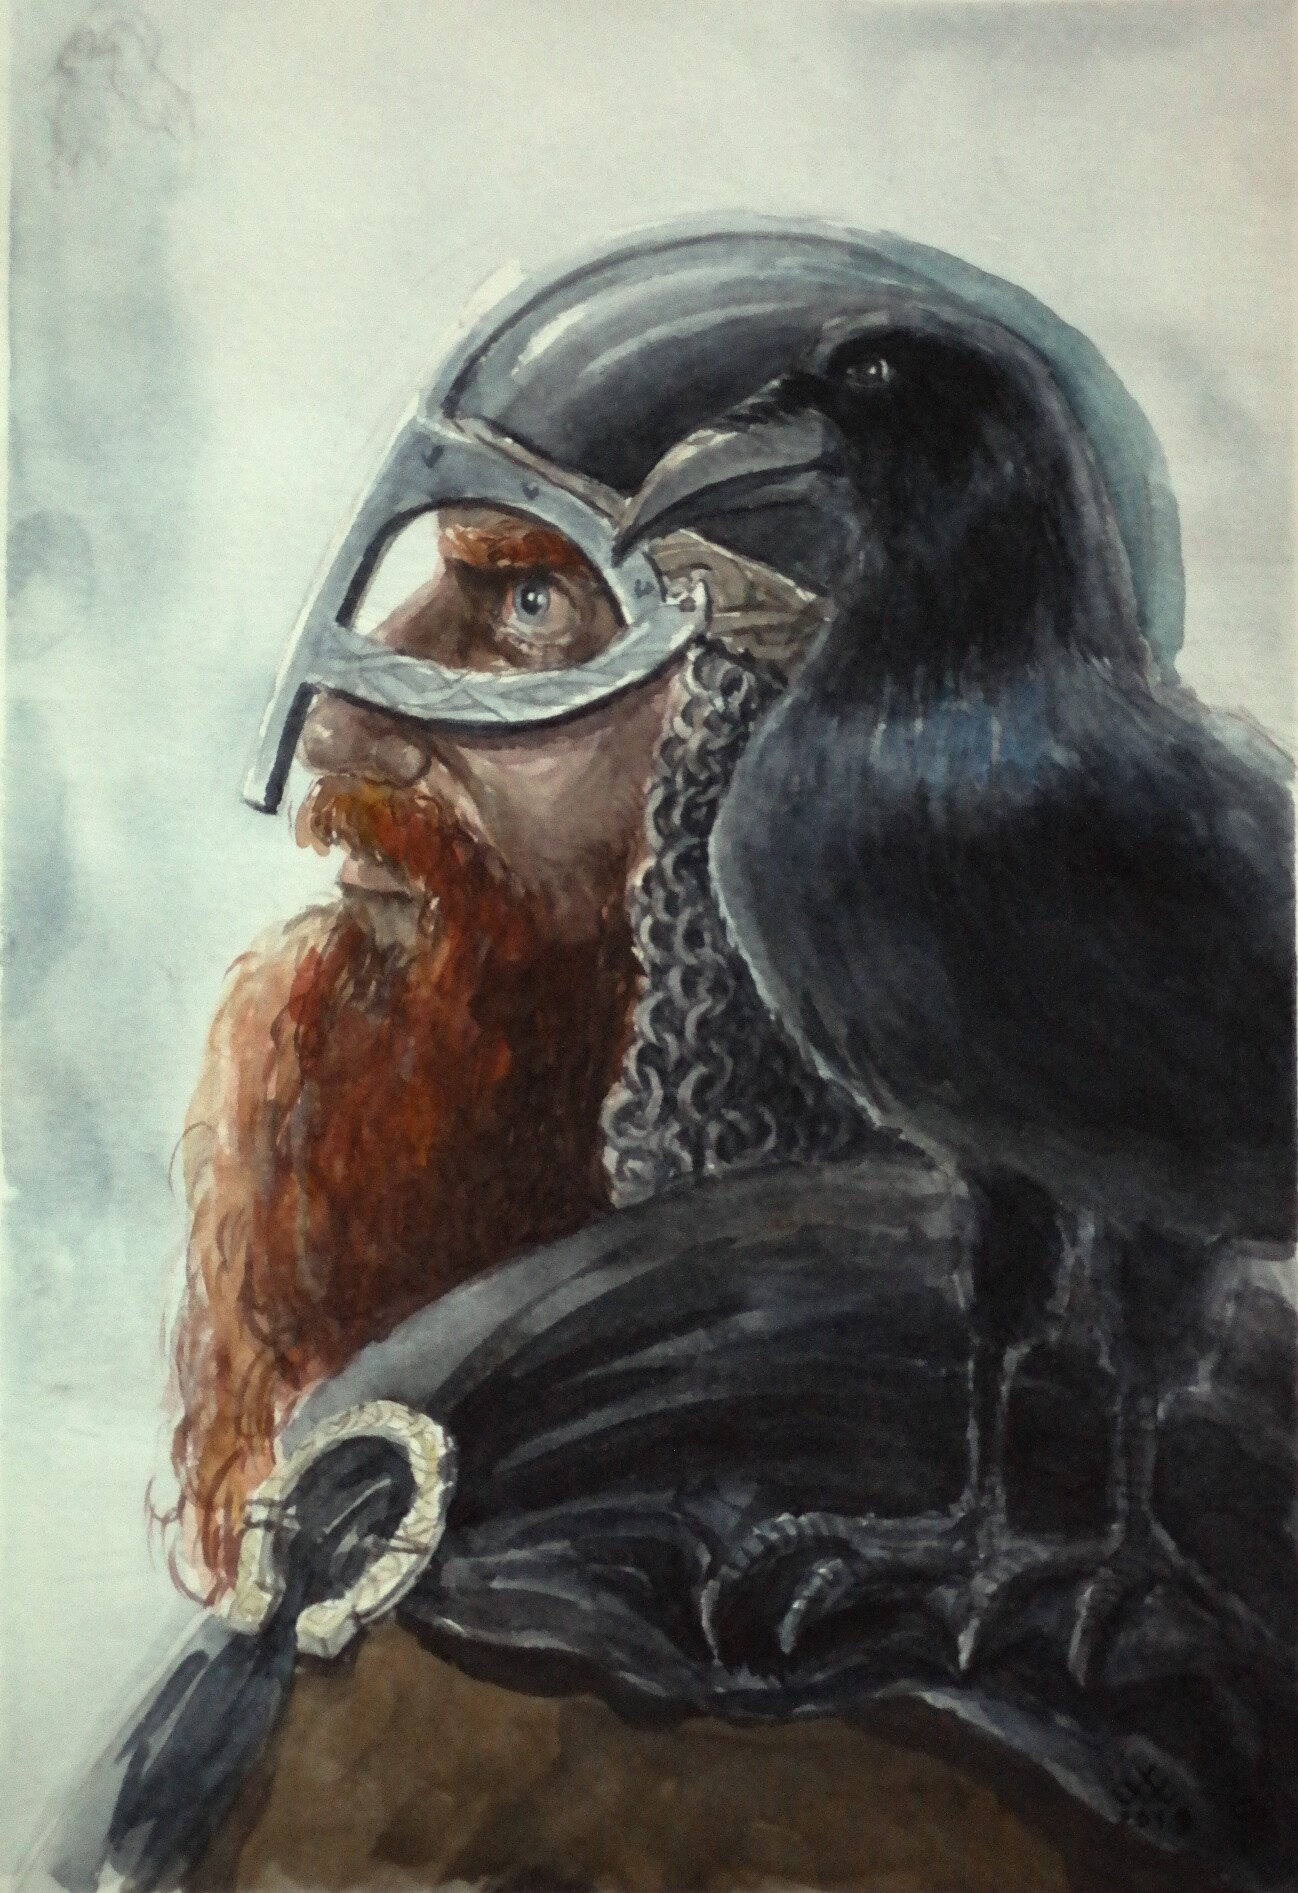 Red beard viking